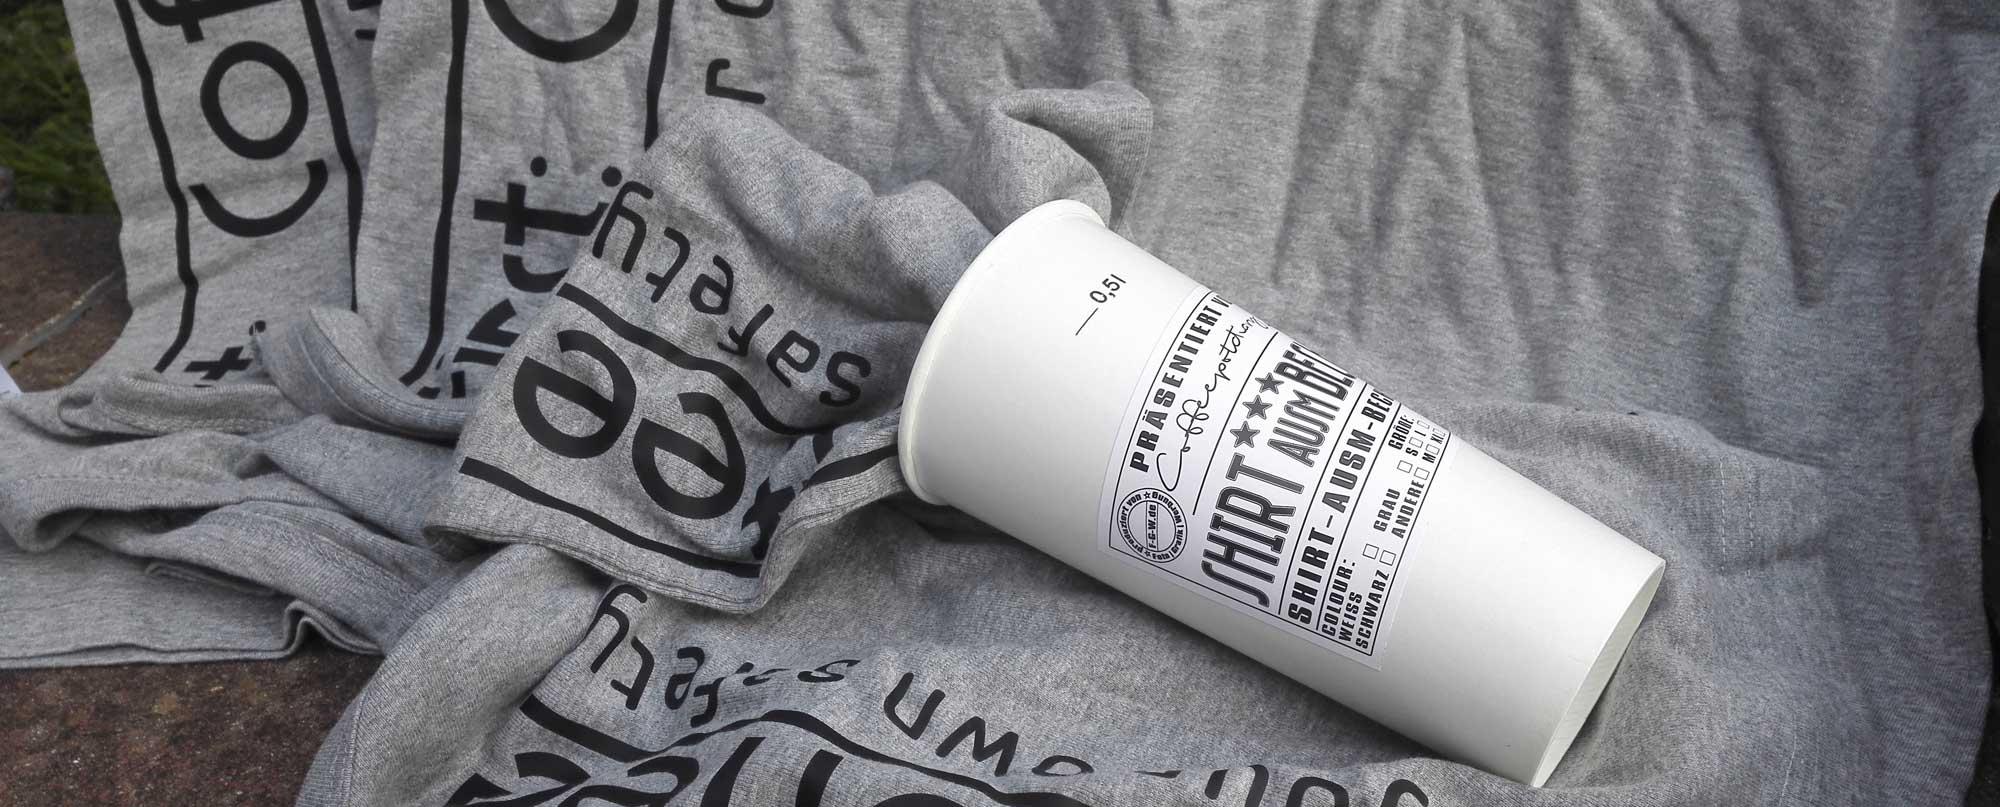 coffeepotdiary copodi shirt gewinnspiel gewinn